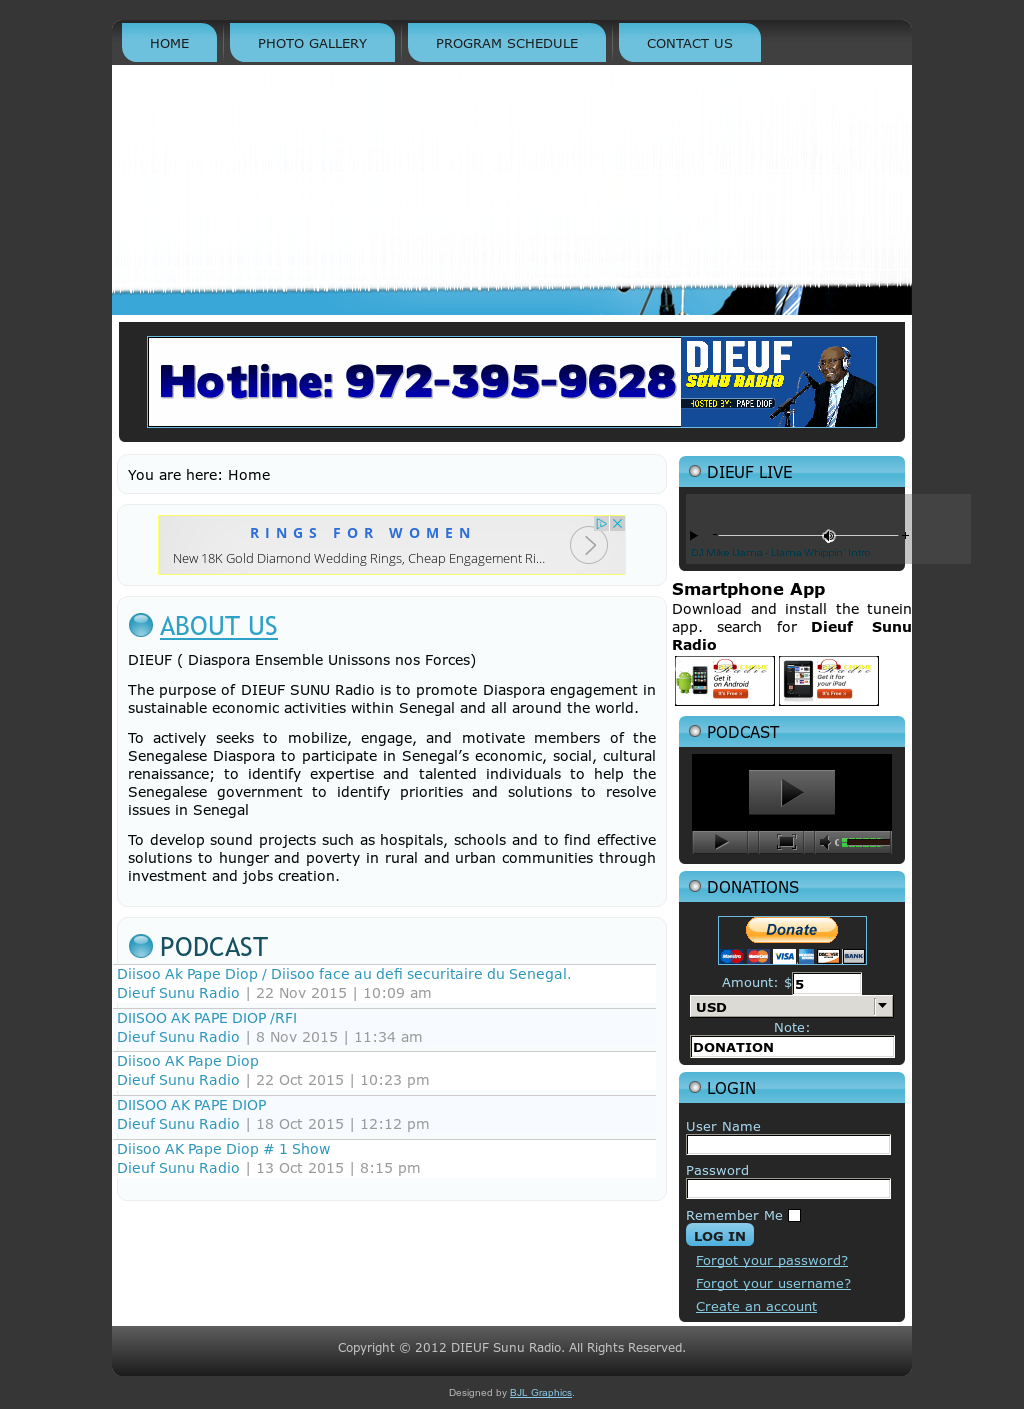 Dieuf Sunu Radio Competitors, Revenue and Employees - Owler